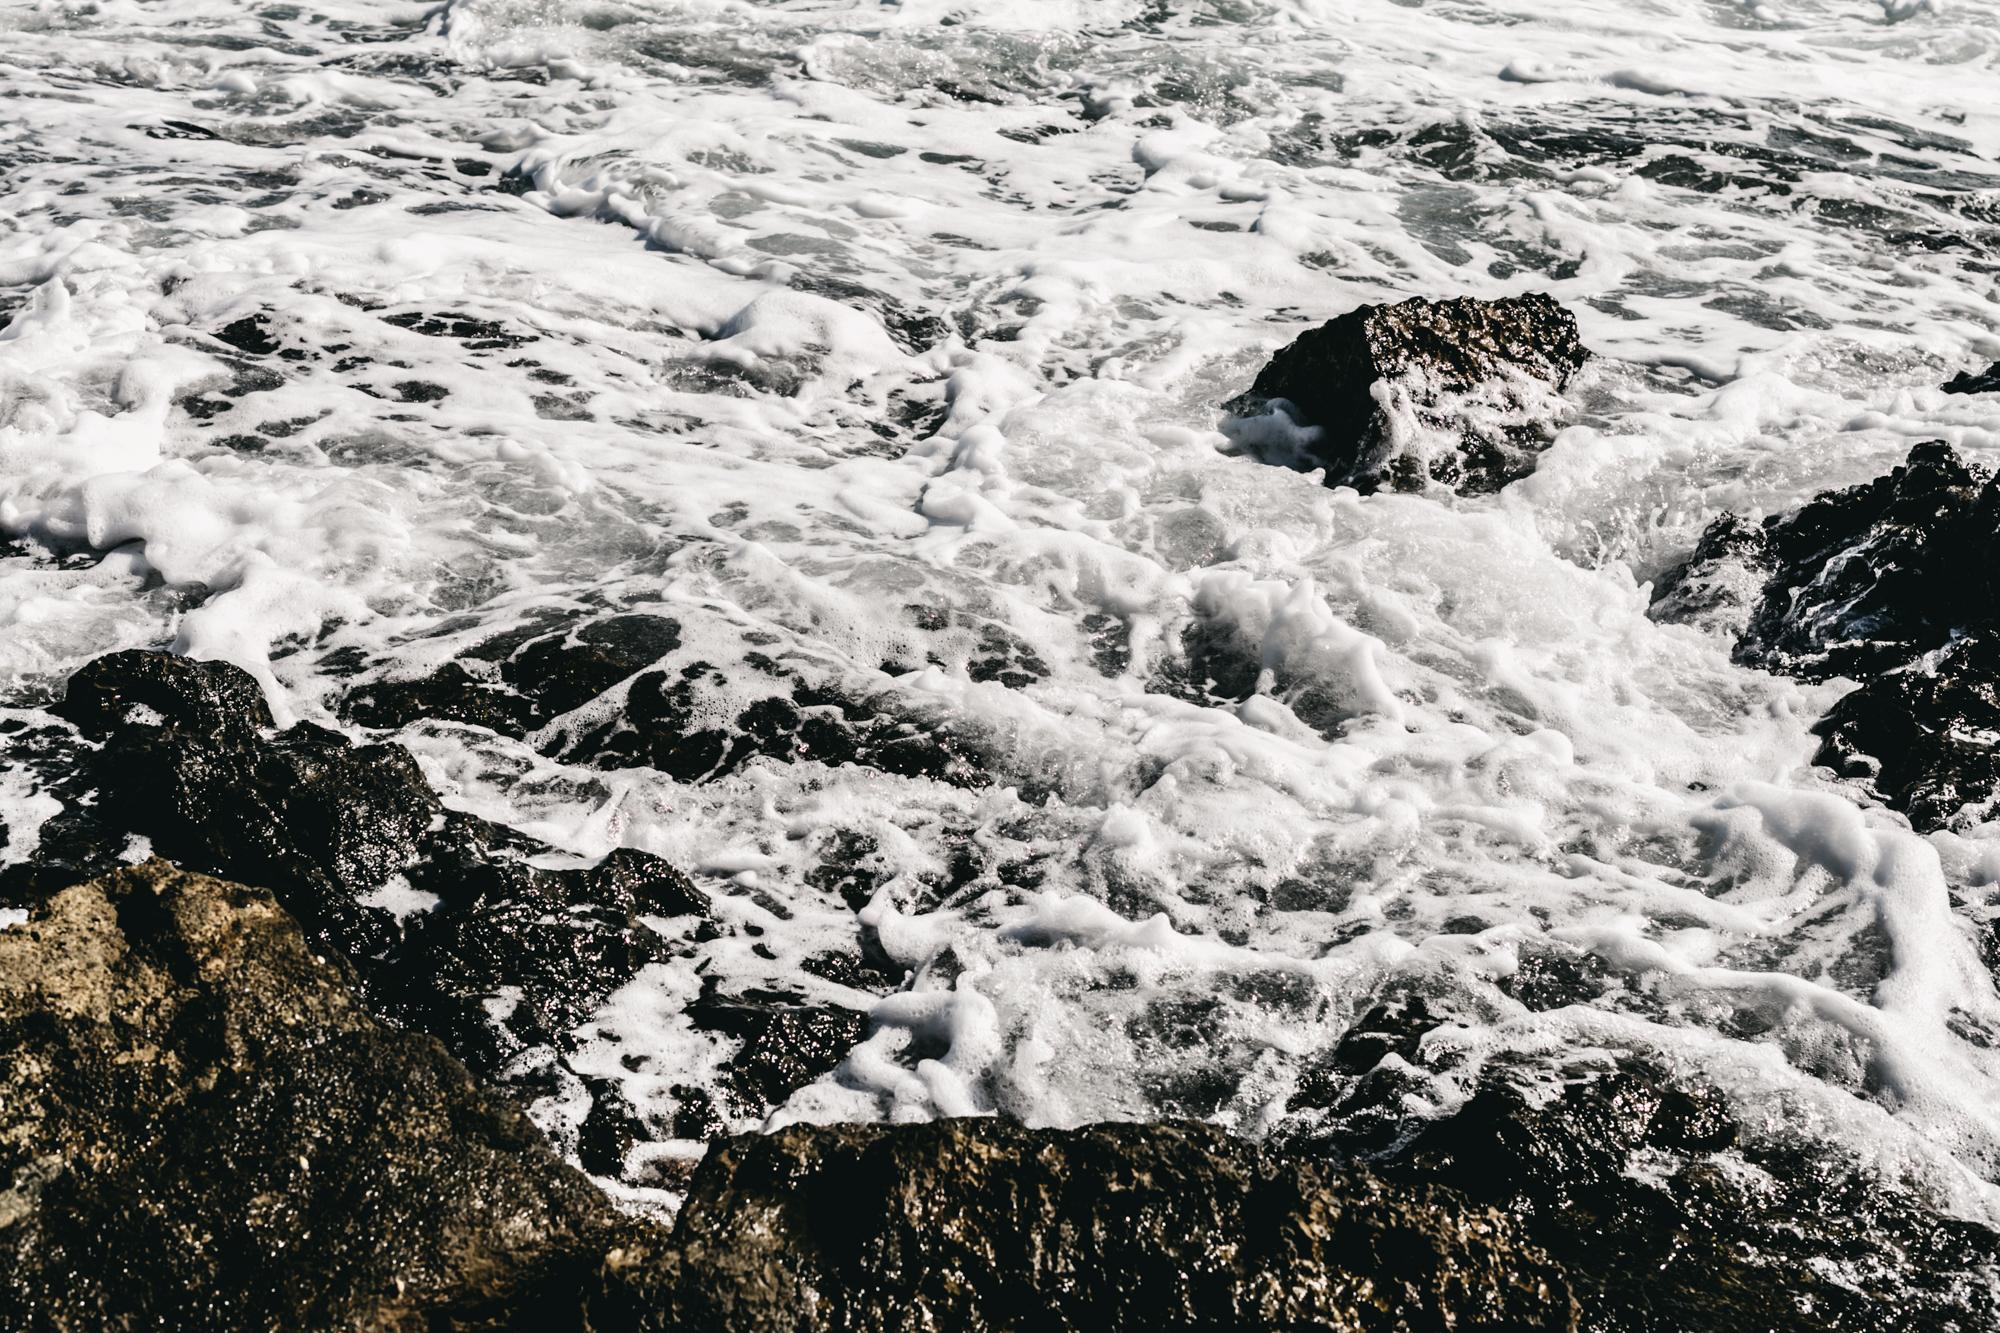 1kayla-rocca-photography-kaylarocca-toronto-8912.jpg